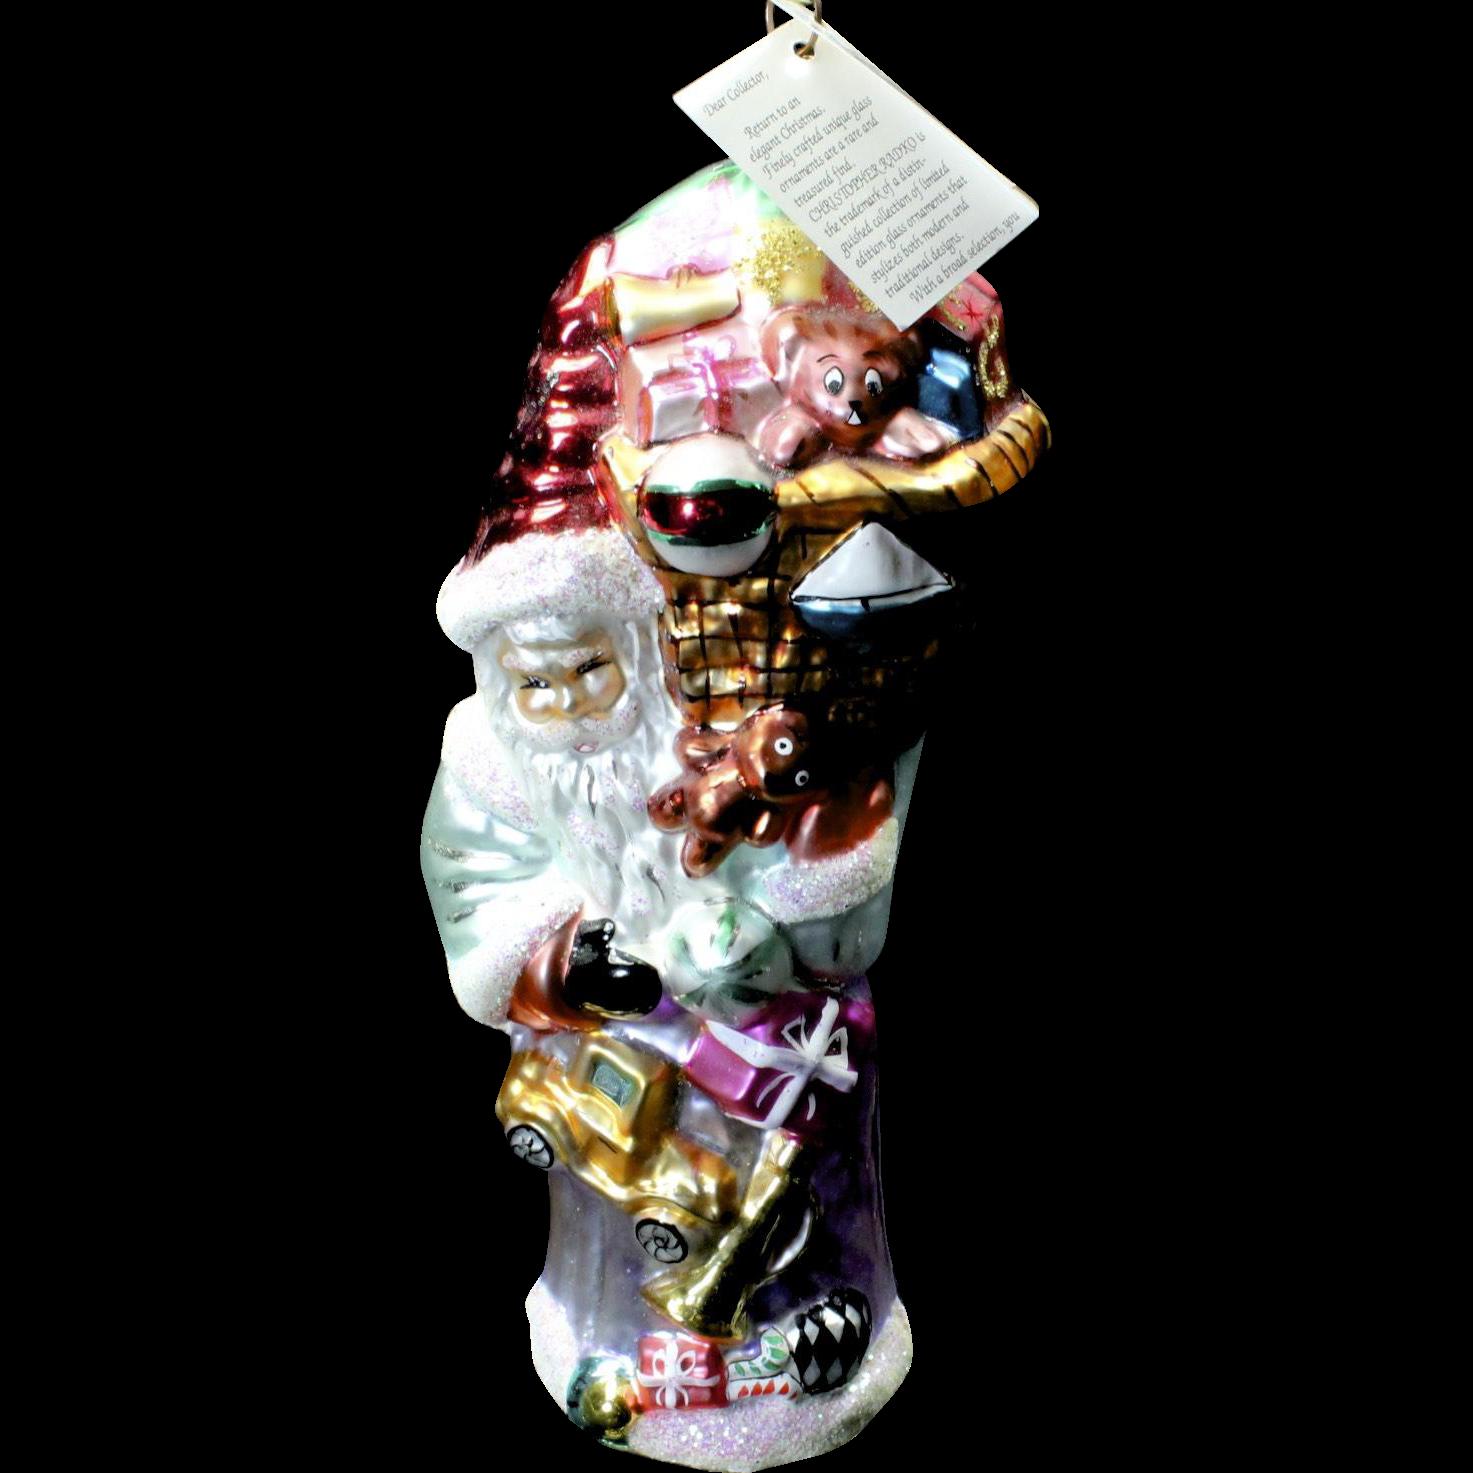 Vintage Radko 1995 Large Santa w/ Toys Hand-Painted Glass Christmas Ornament Tag